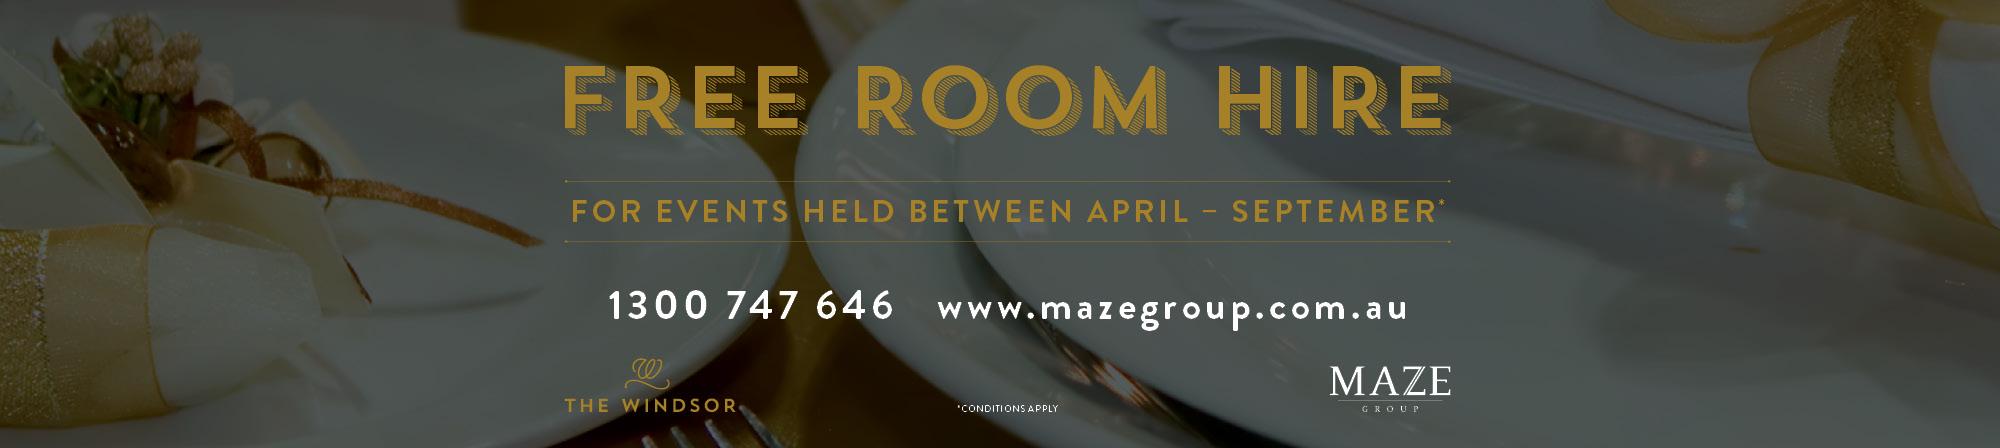 MAZE-Free-Room-Hire-Web-slider